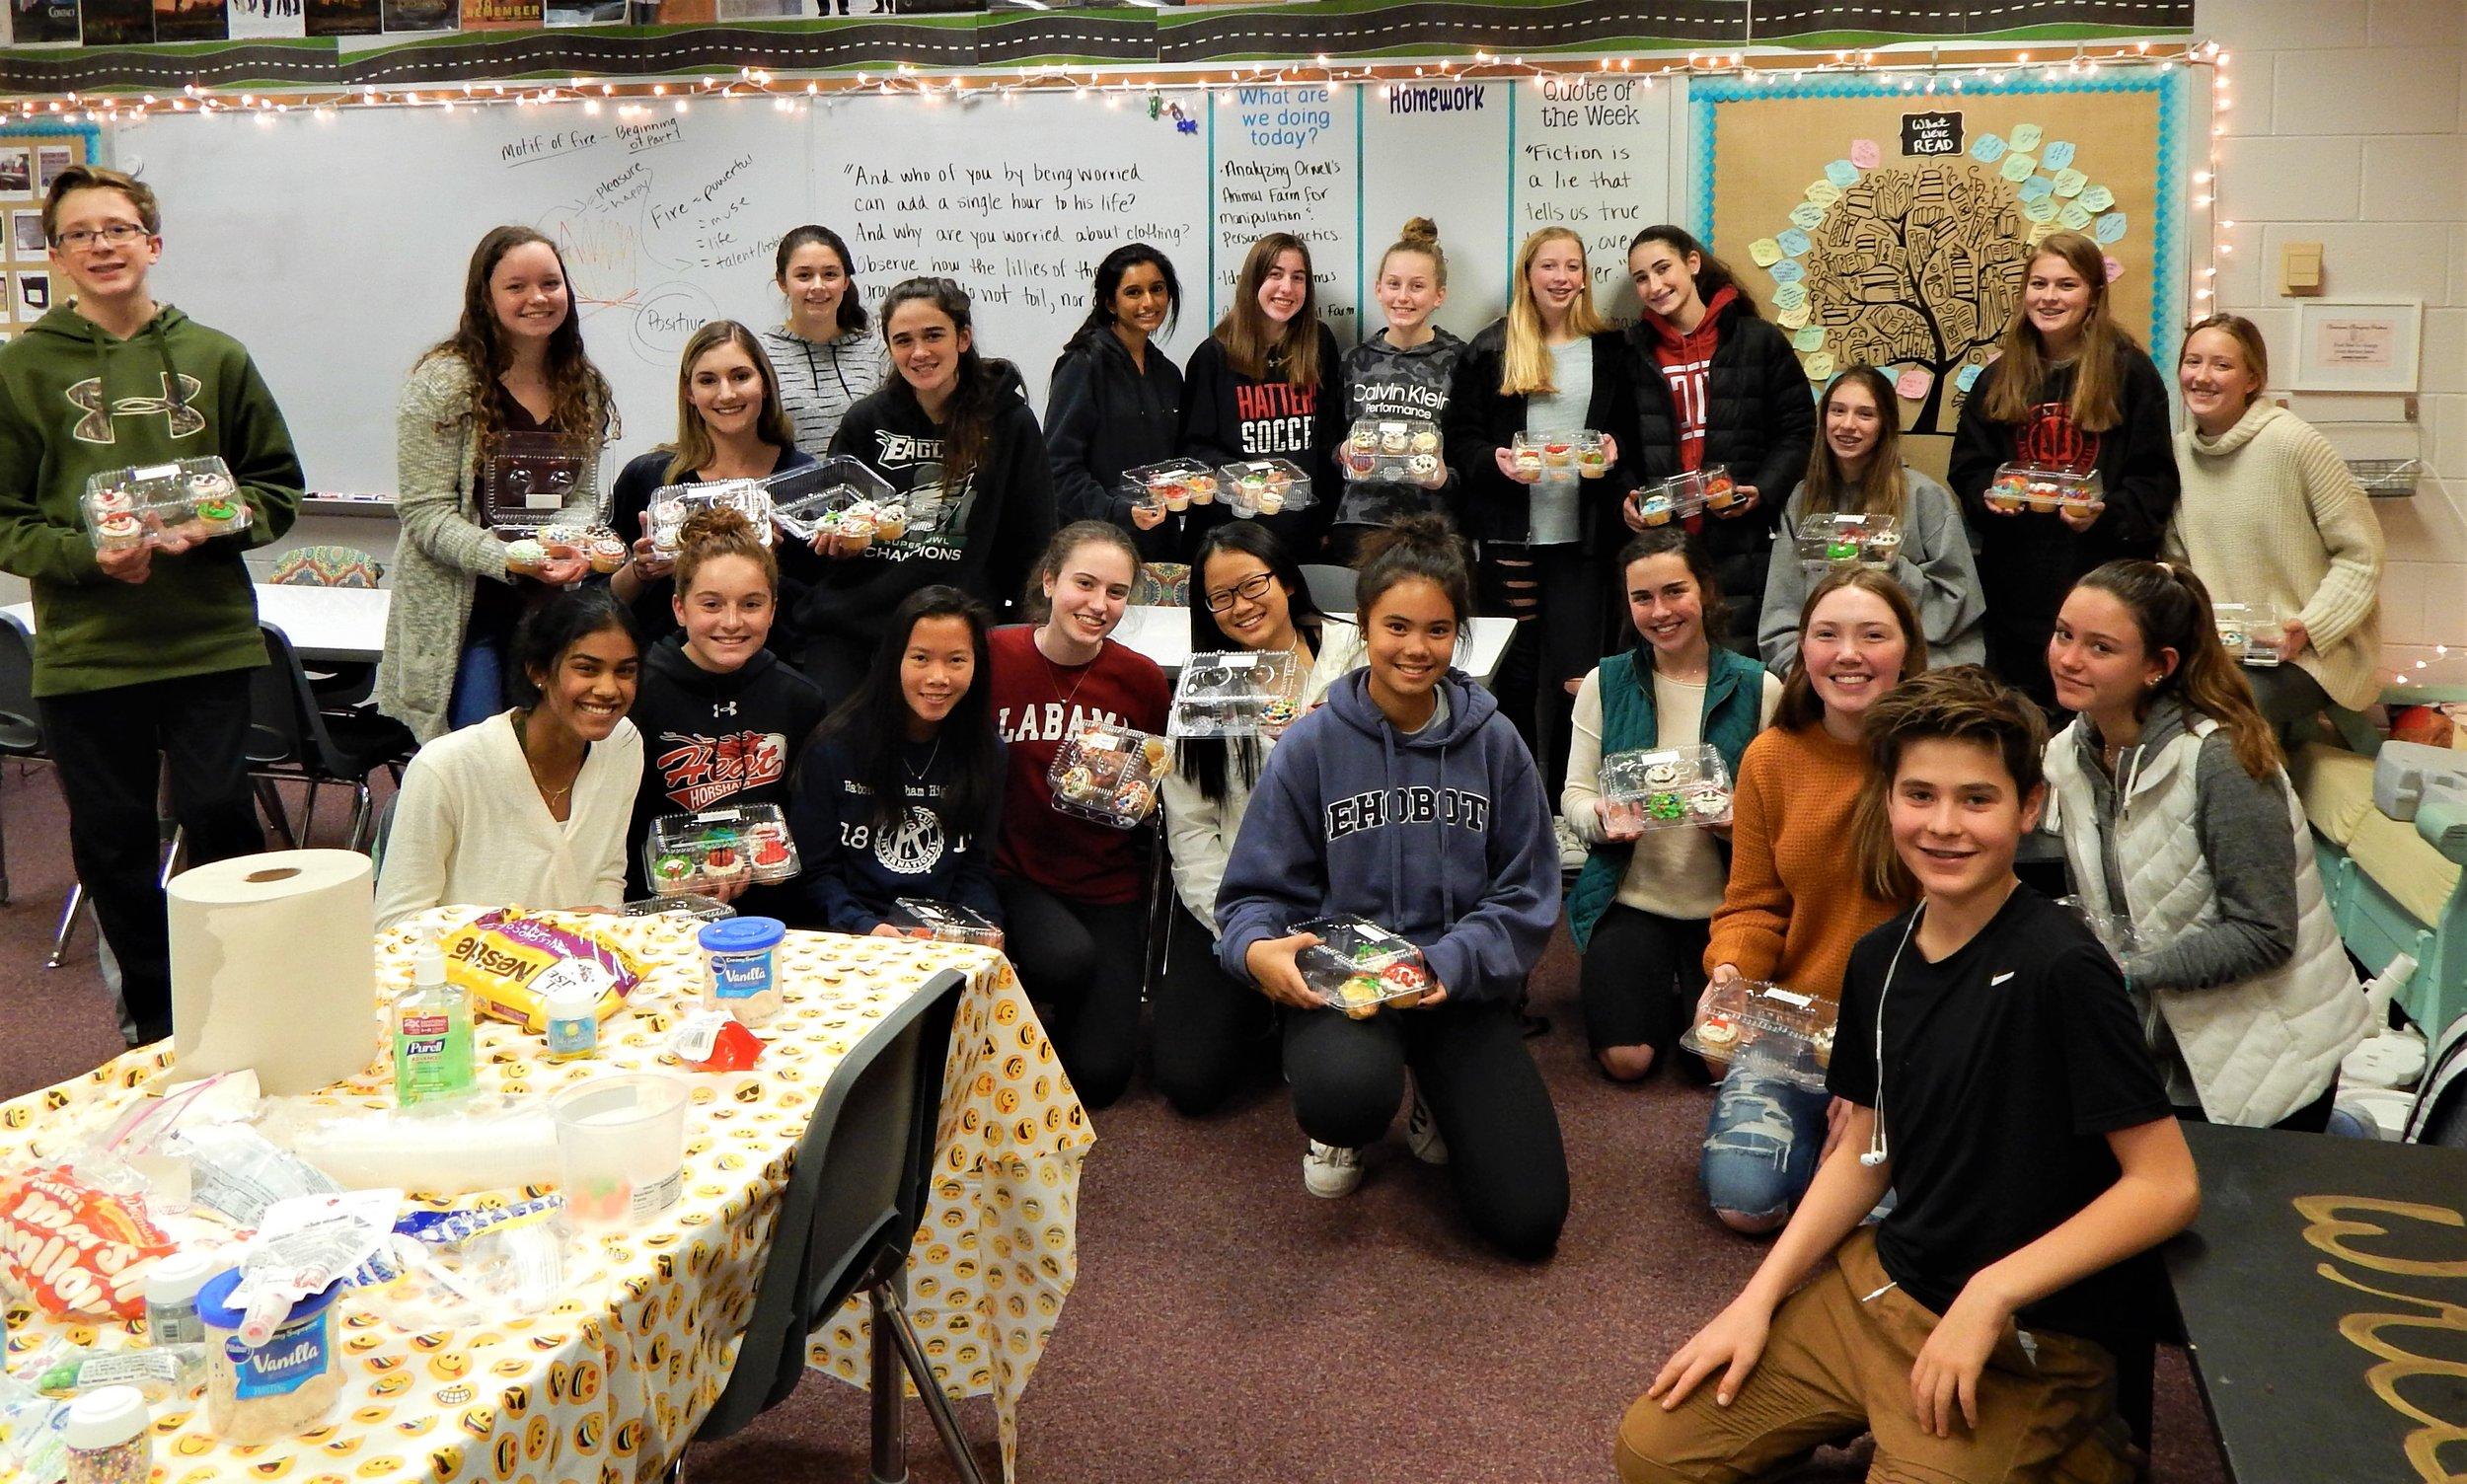 HHHS 12-11 Cupcake Party Group.jpg